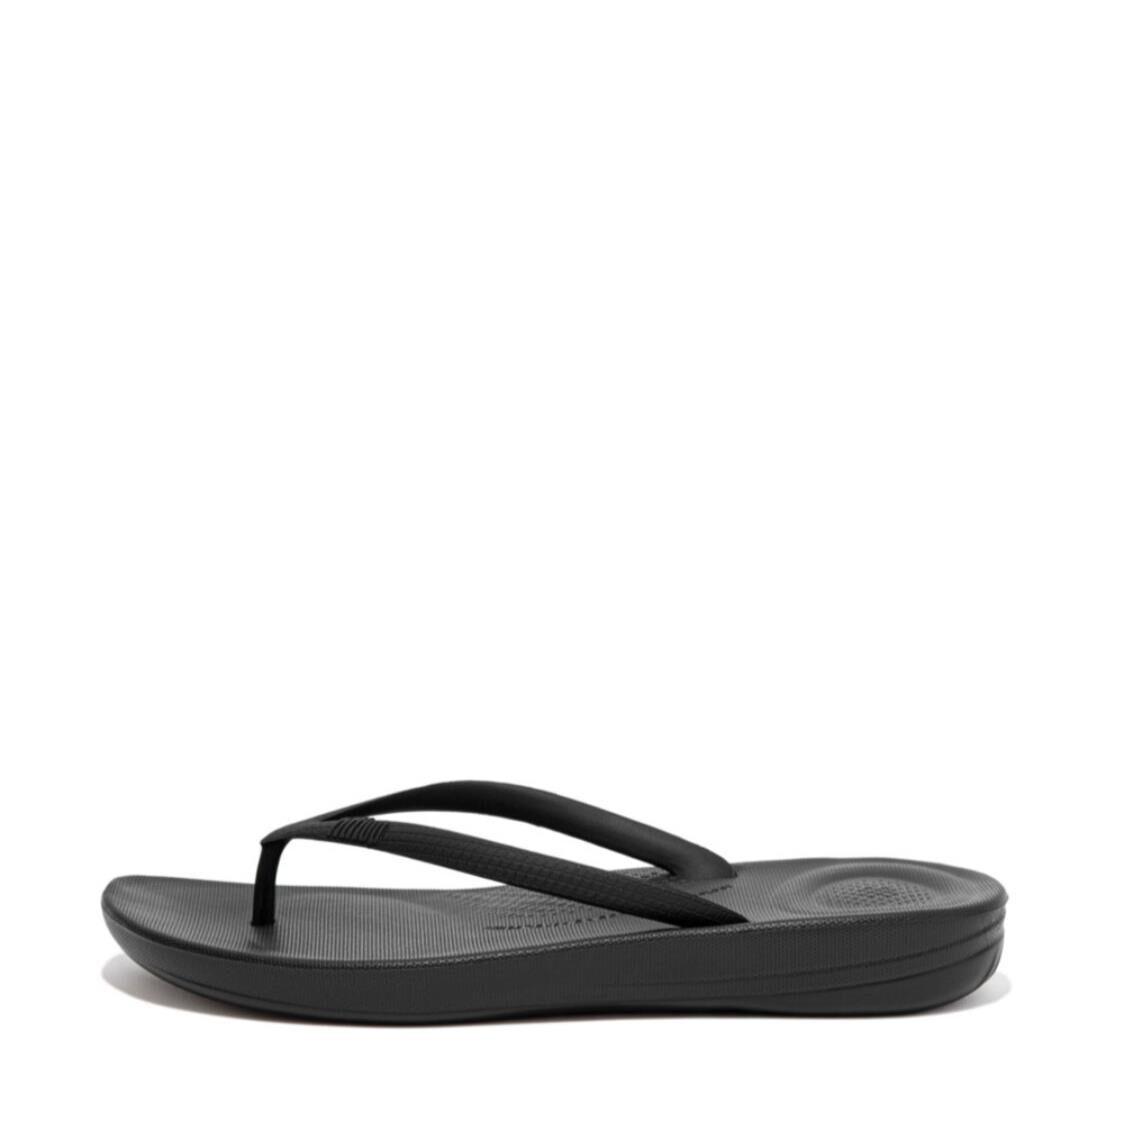 Fitflop Iqushion Ergonomic Flip Flops All Black E54-090